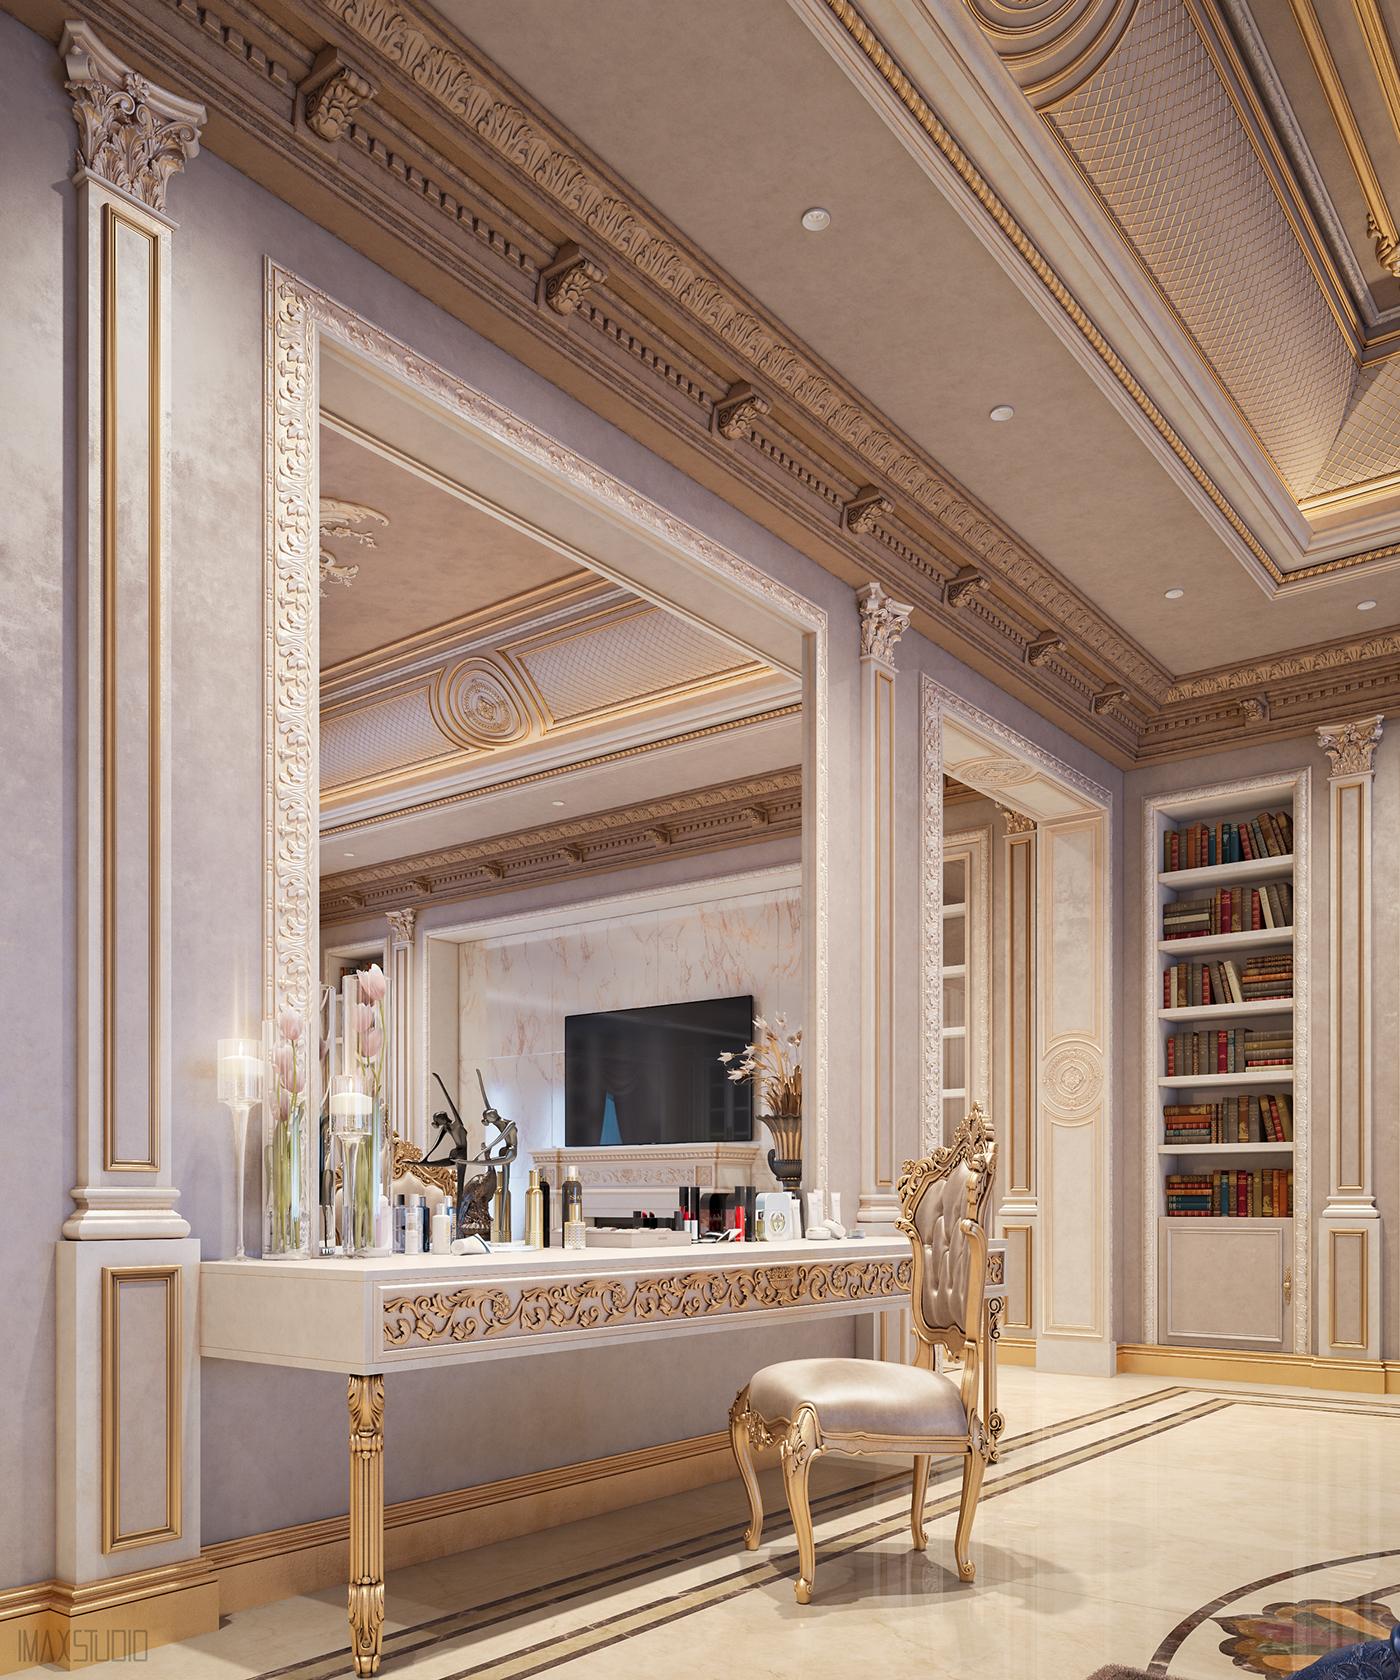 Interior interior design  Master bedroom luxury